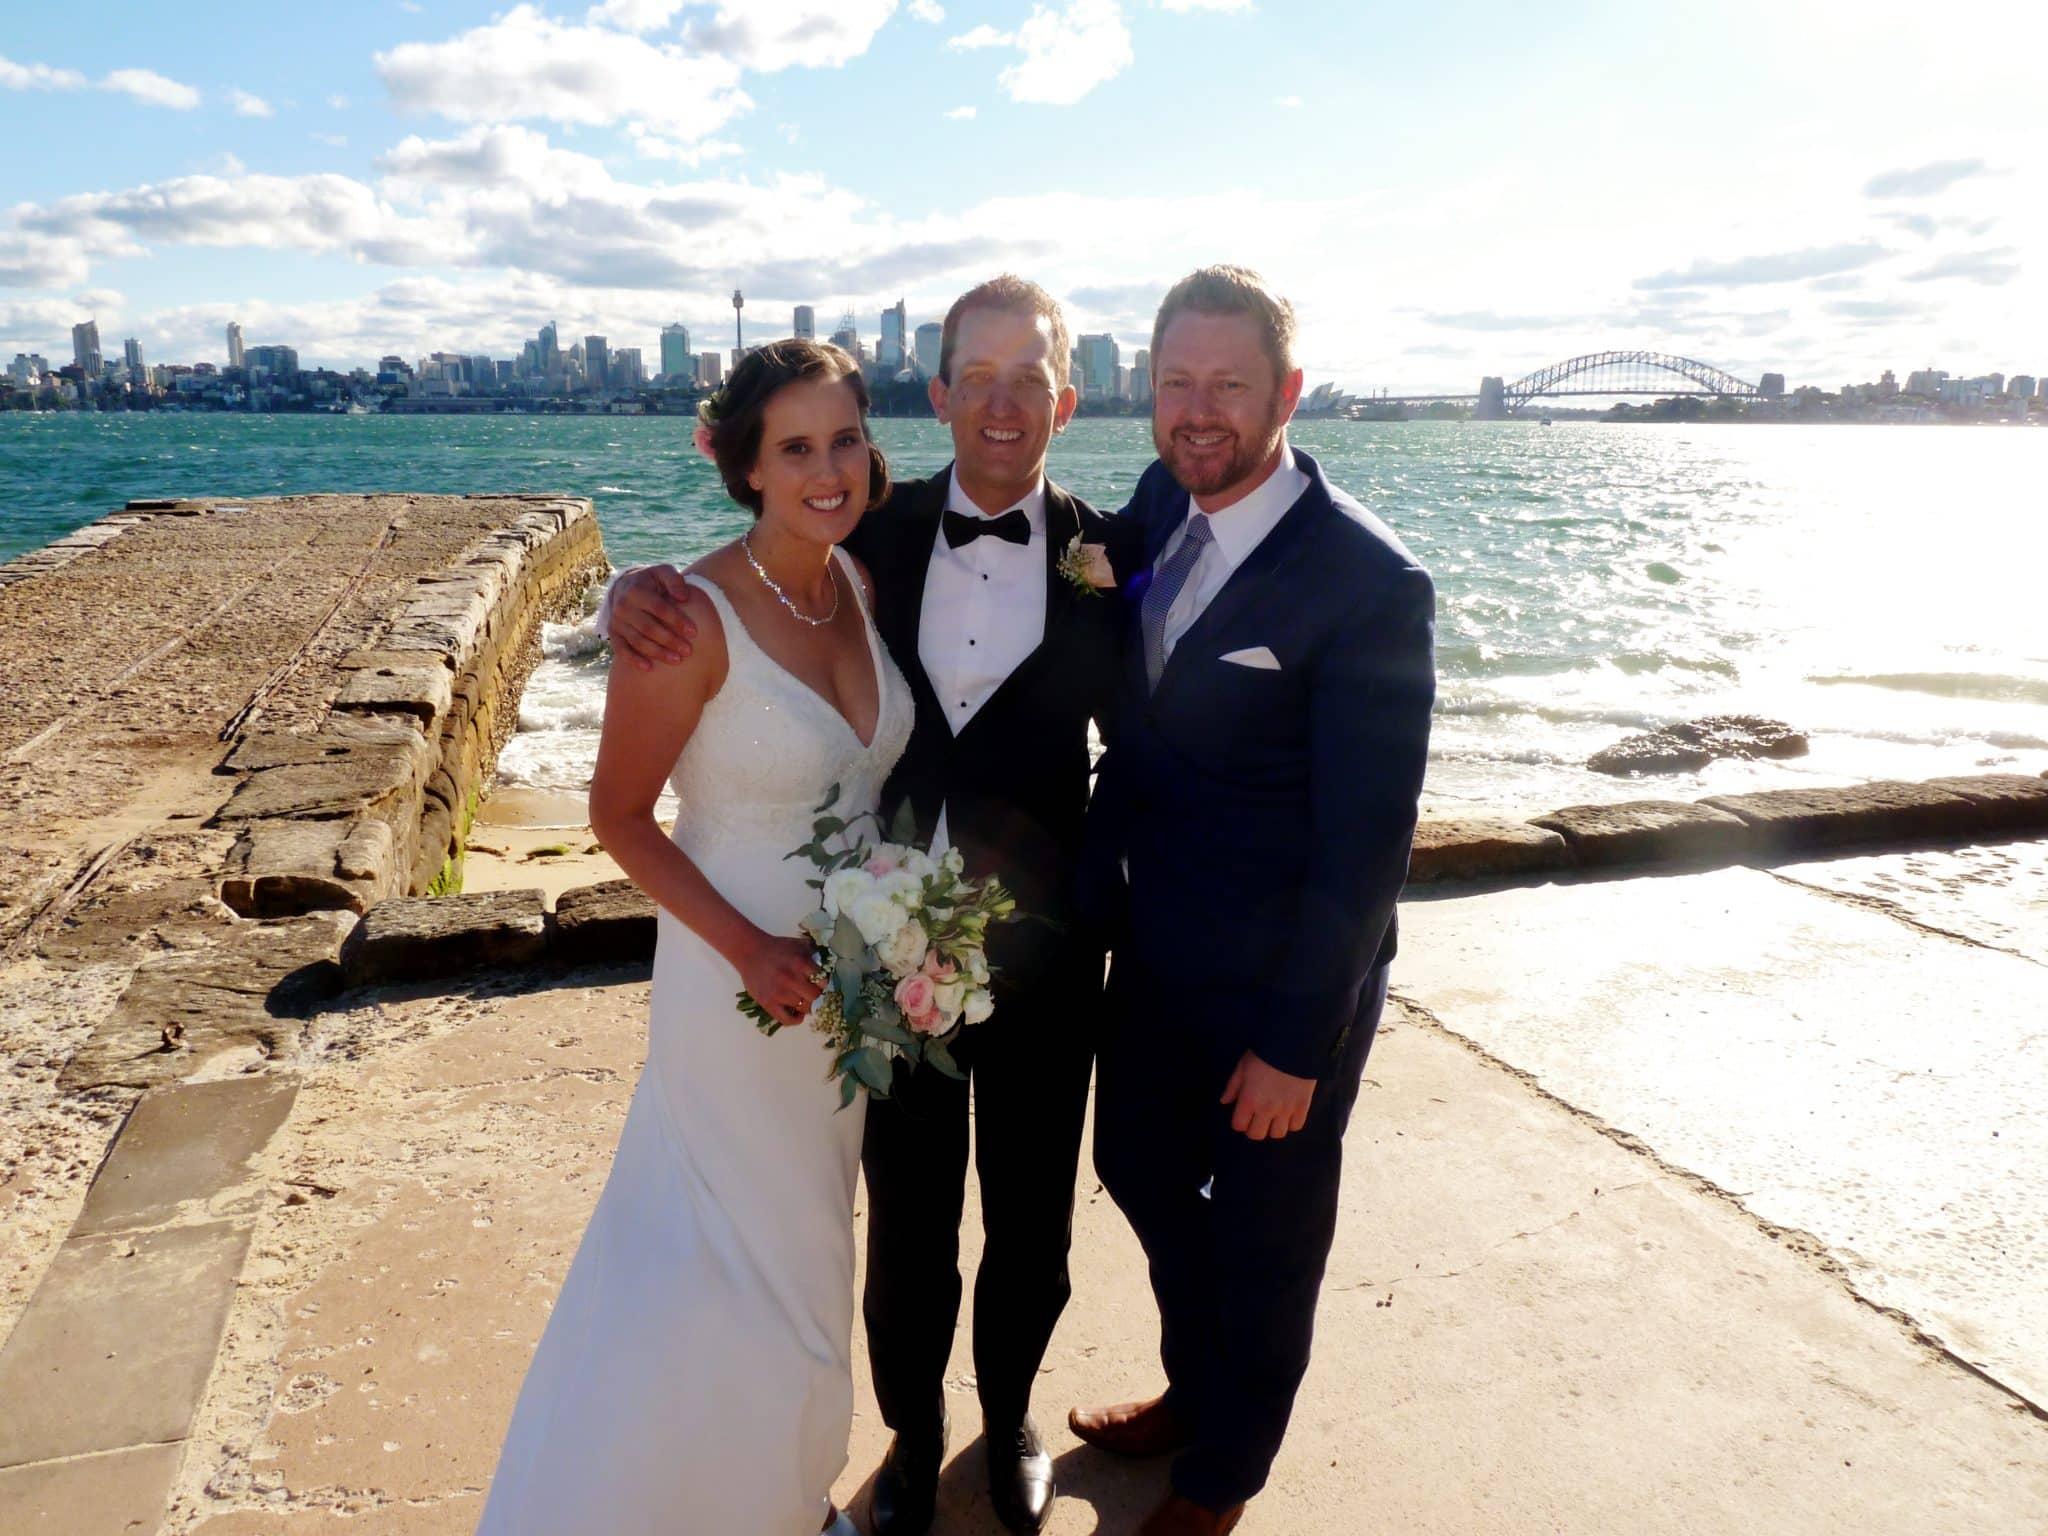 Chris and Hannah's Wedding at Bradleys Head - Stephen Lee Marriage Celebrant Sydney